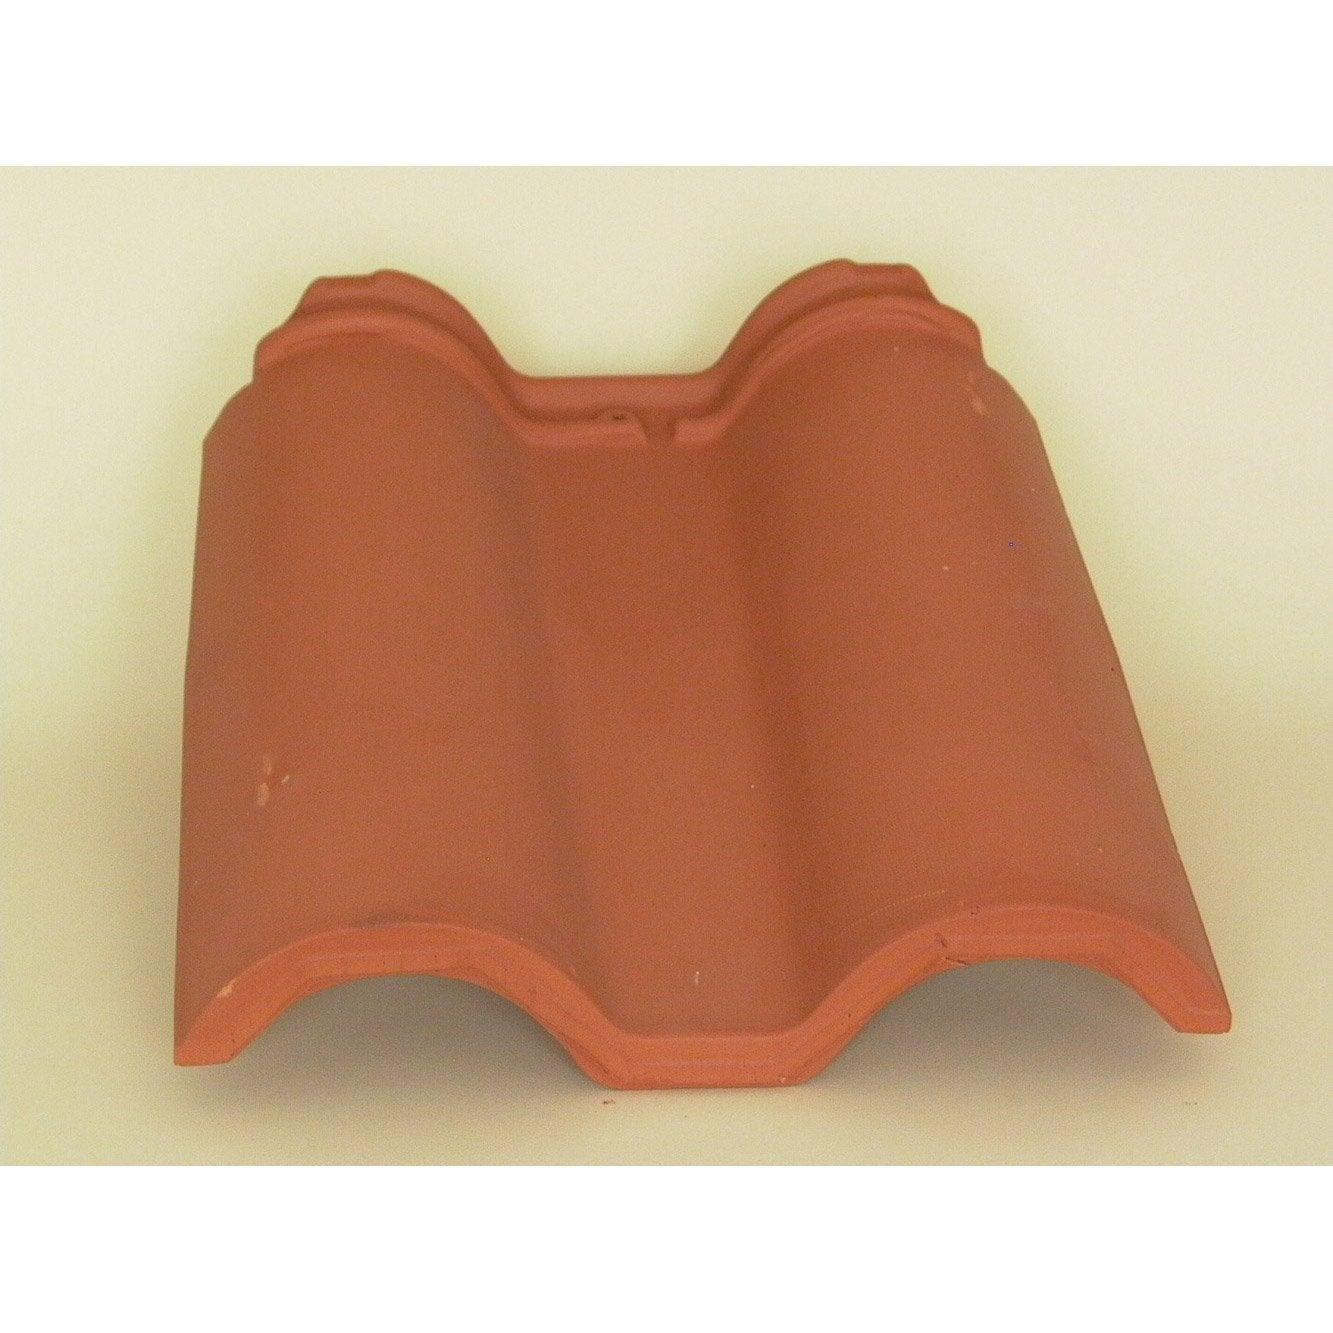 tuile double mosso rouge romane leroy merlin. Black Bedroom Furniture Sets. Home Design Ideas